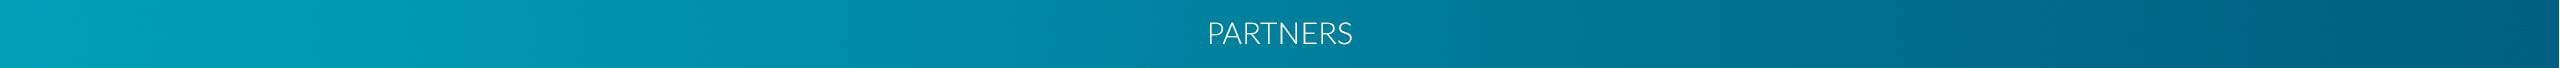 NETSTERIL title partners